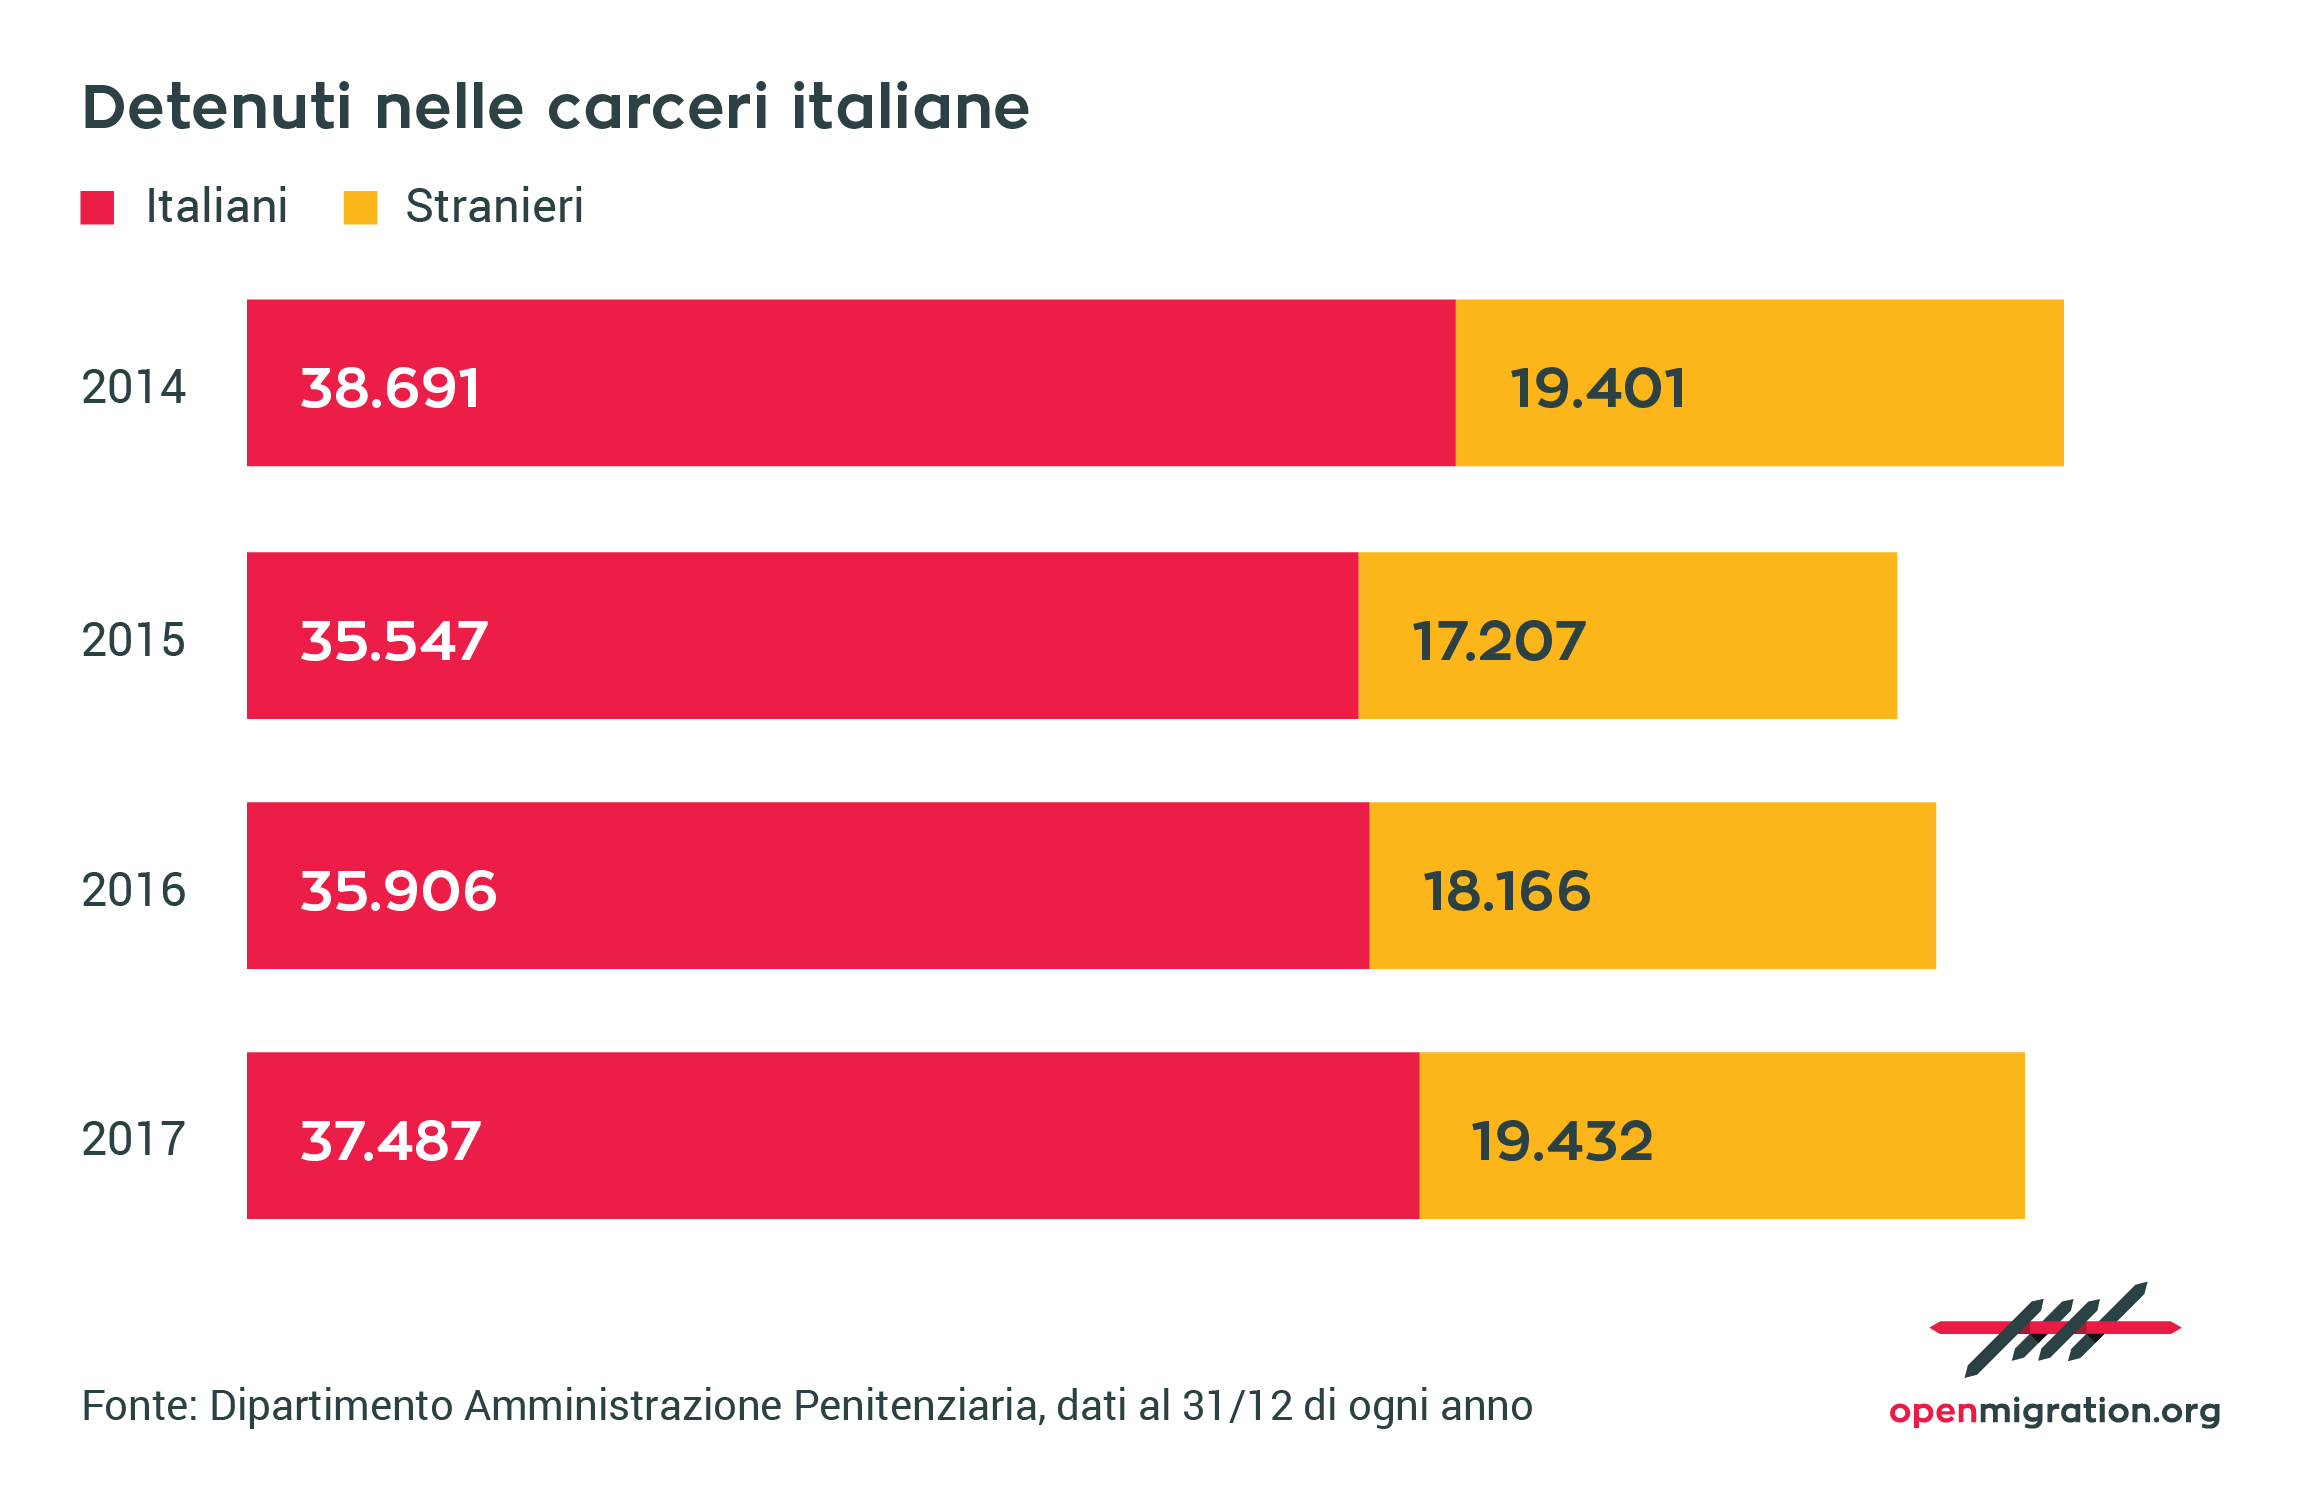 Detenuti stranieri nelle carceri italiane (2014-2017)